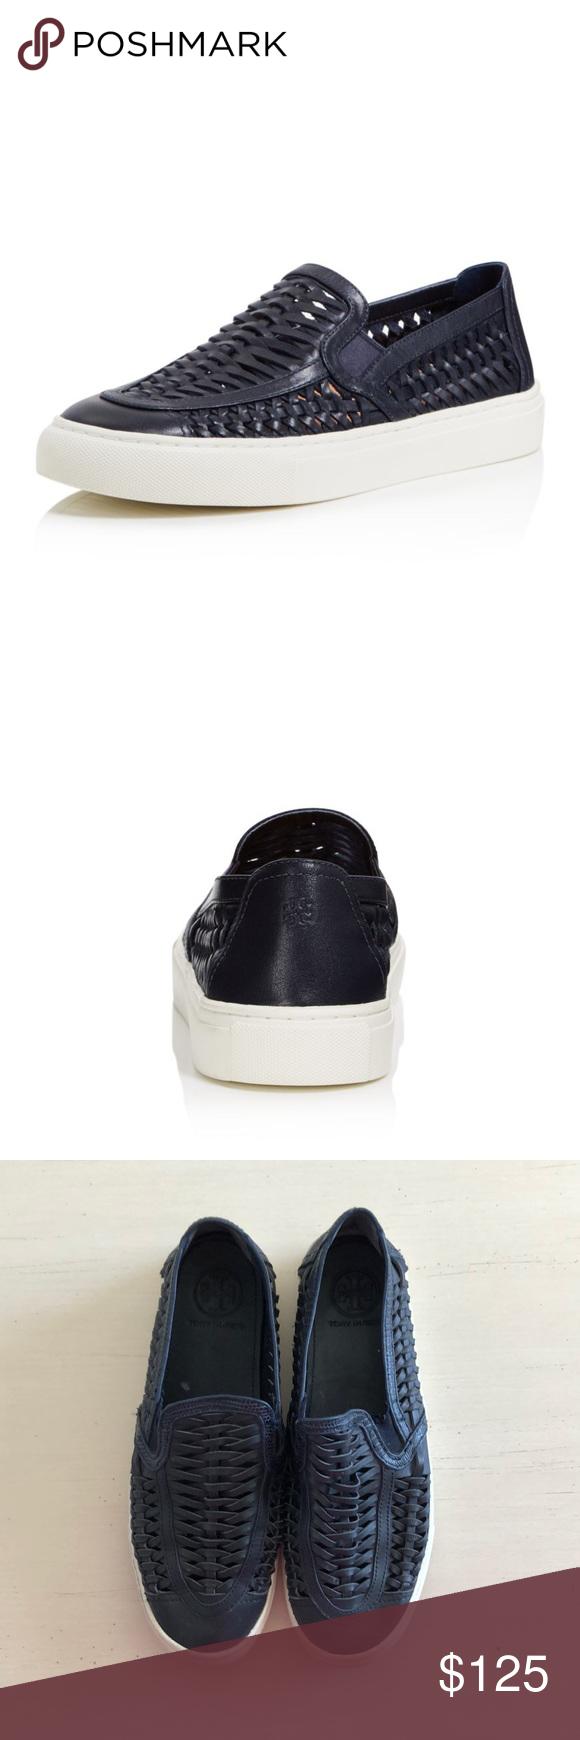 428814812415 Tory Burch Navy Huarache 2 Slip-On Sneaker